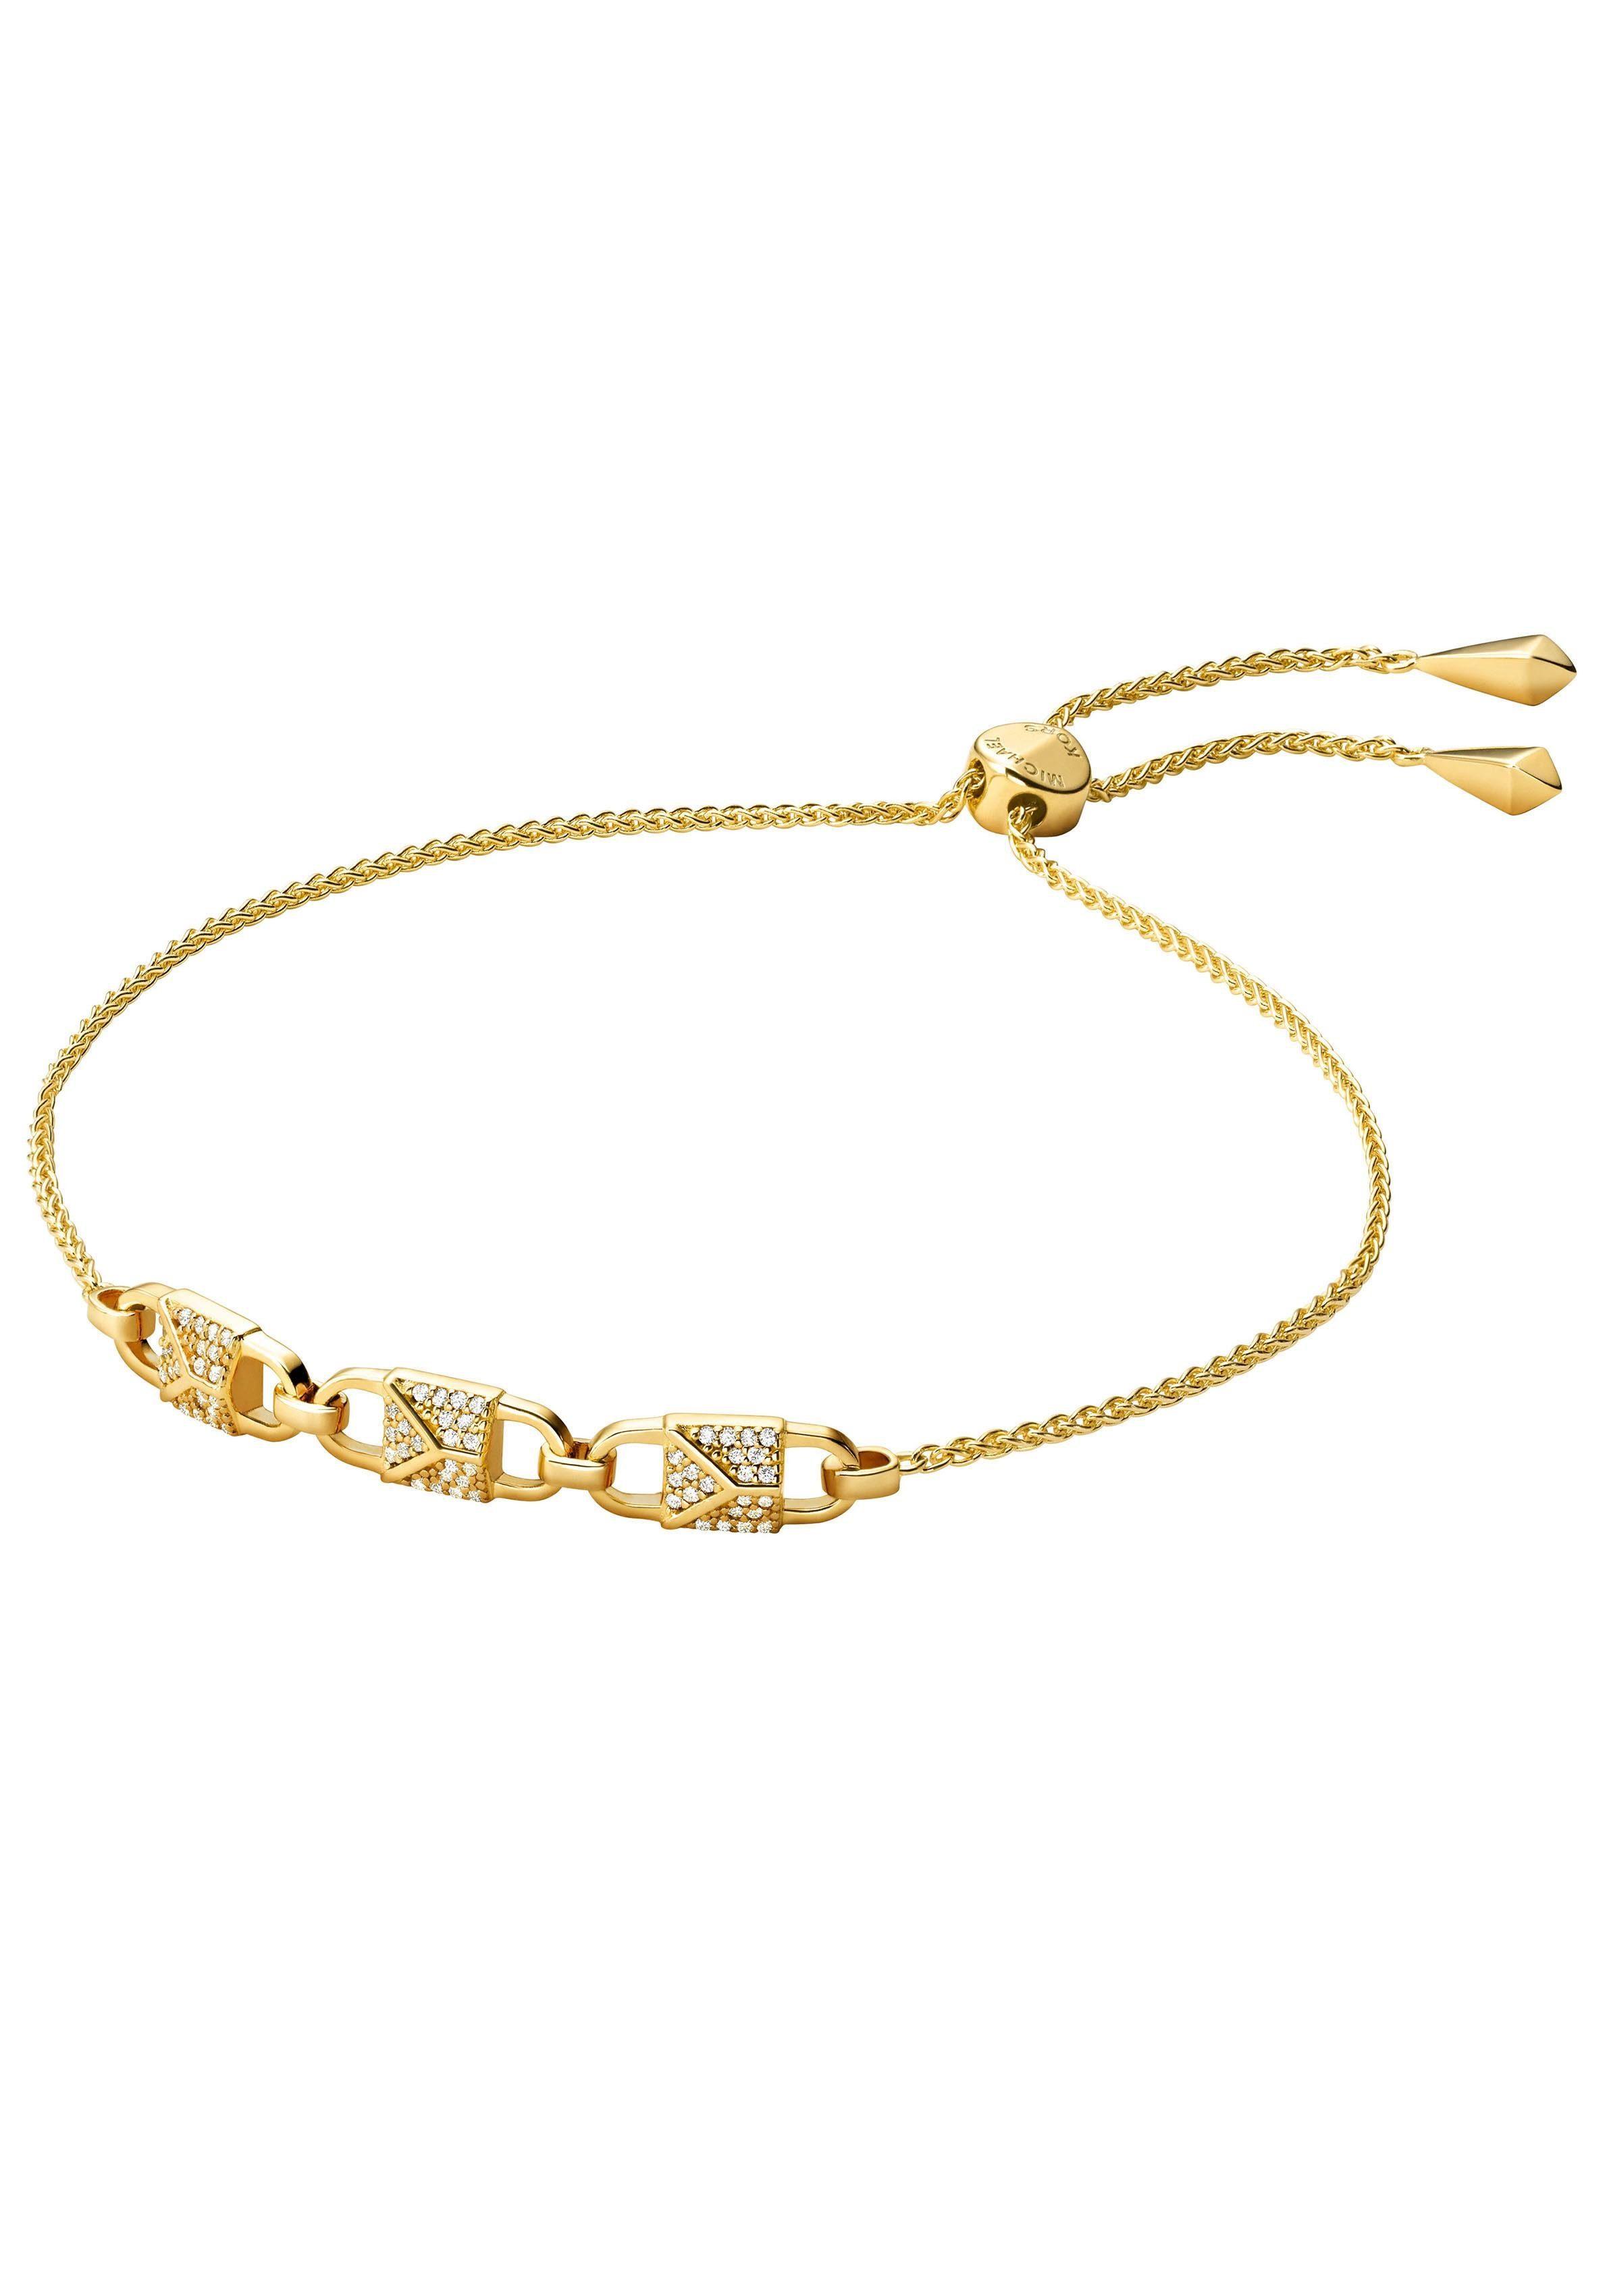 MICHAEL KORS Armband »PREMIUM, MKC1134AN710« mit Zirkonia